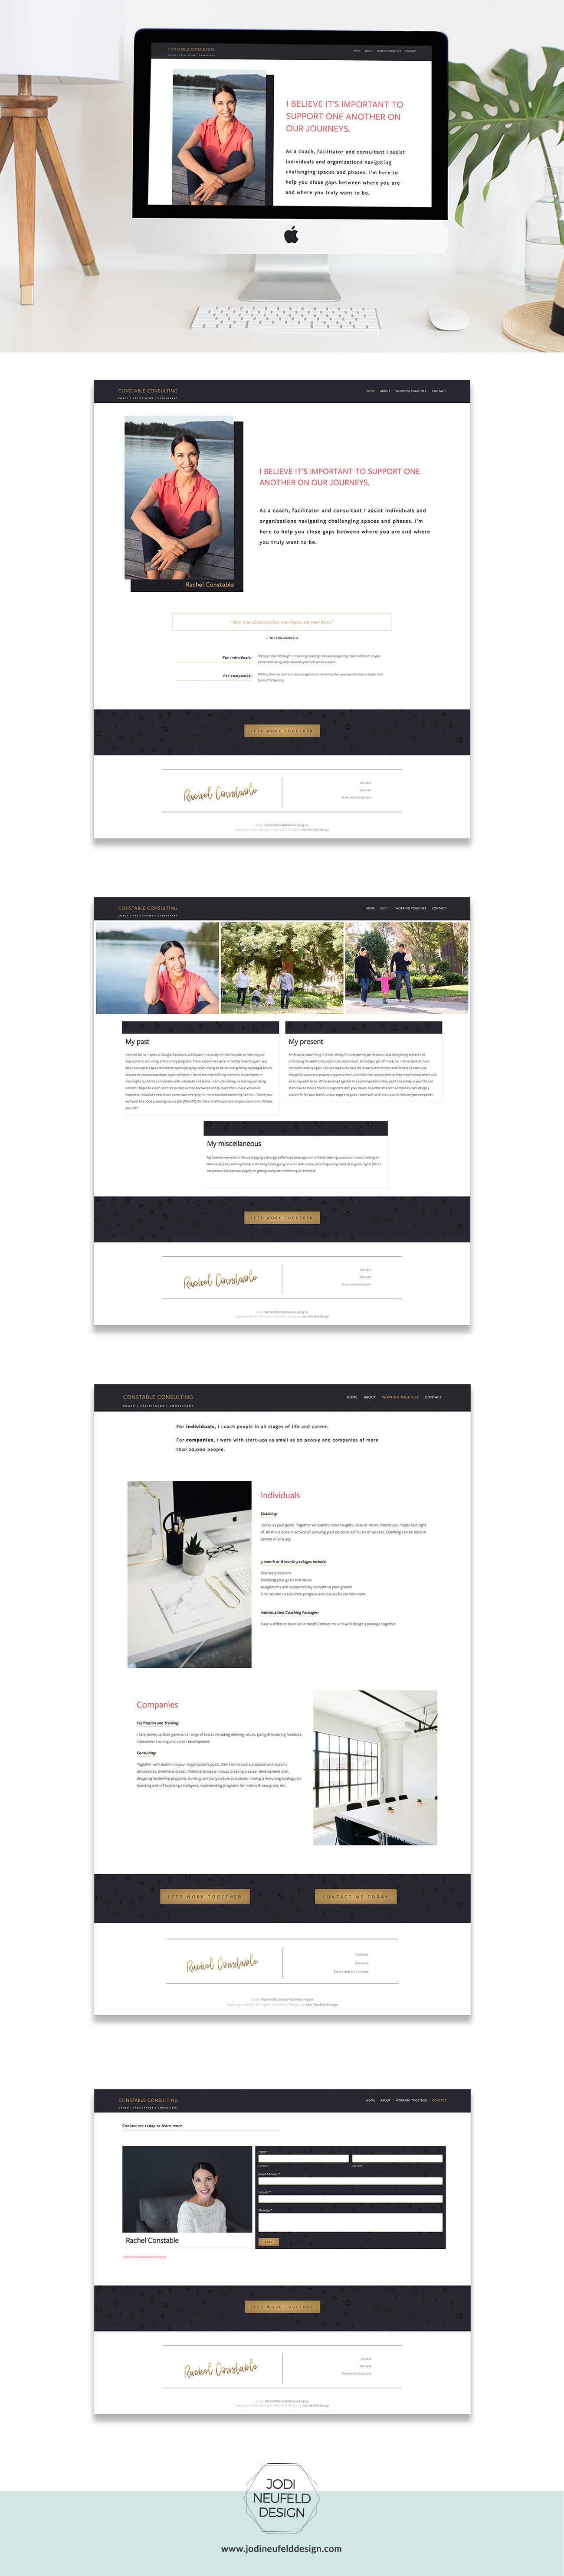 Constable Consulting   Squarespace Web Design by Jodi Neufeld Design